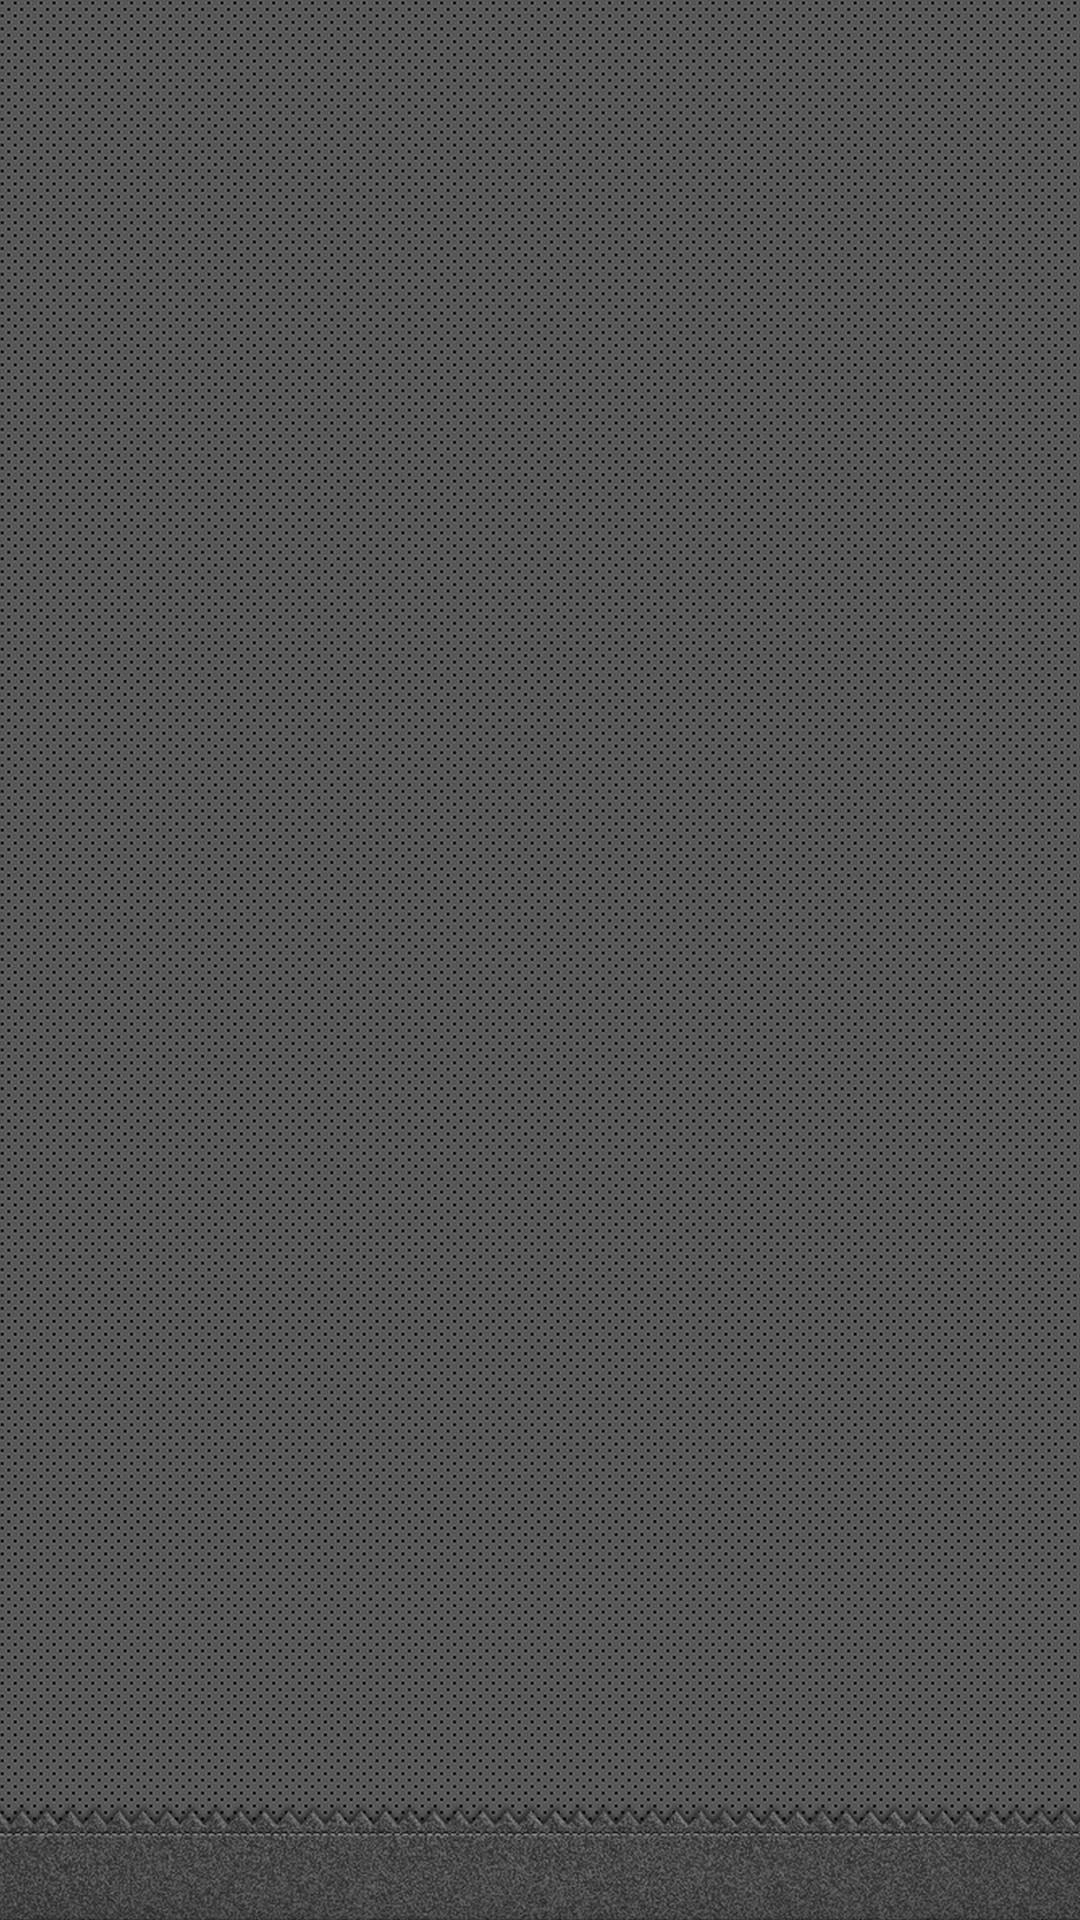 Gray phone wallpaper hd